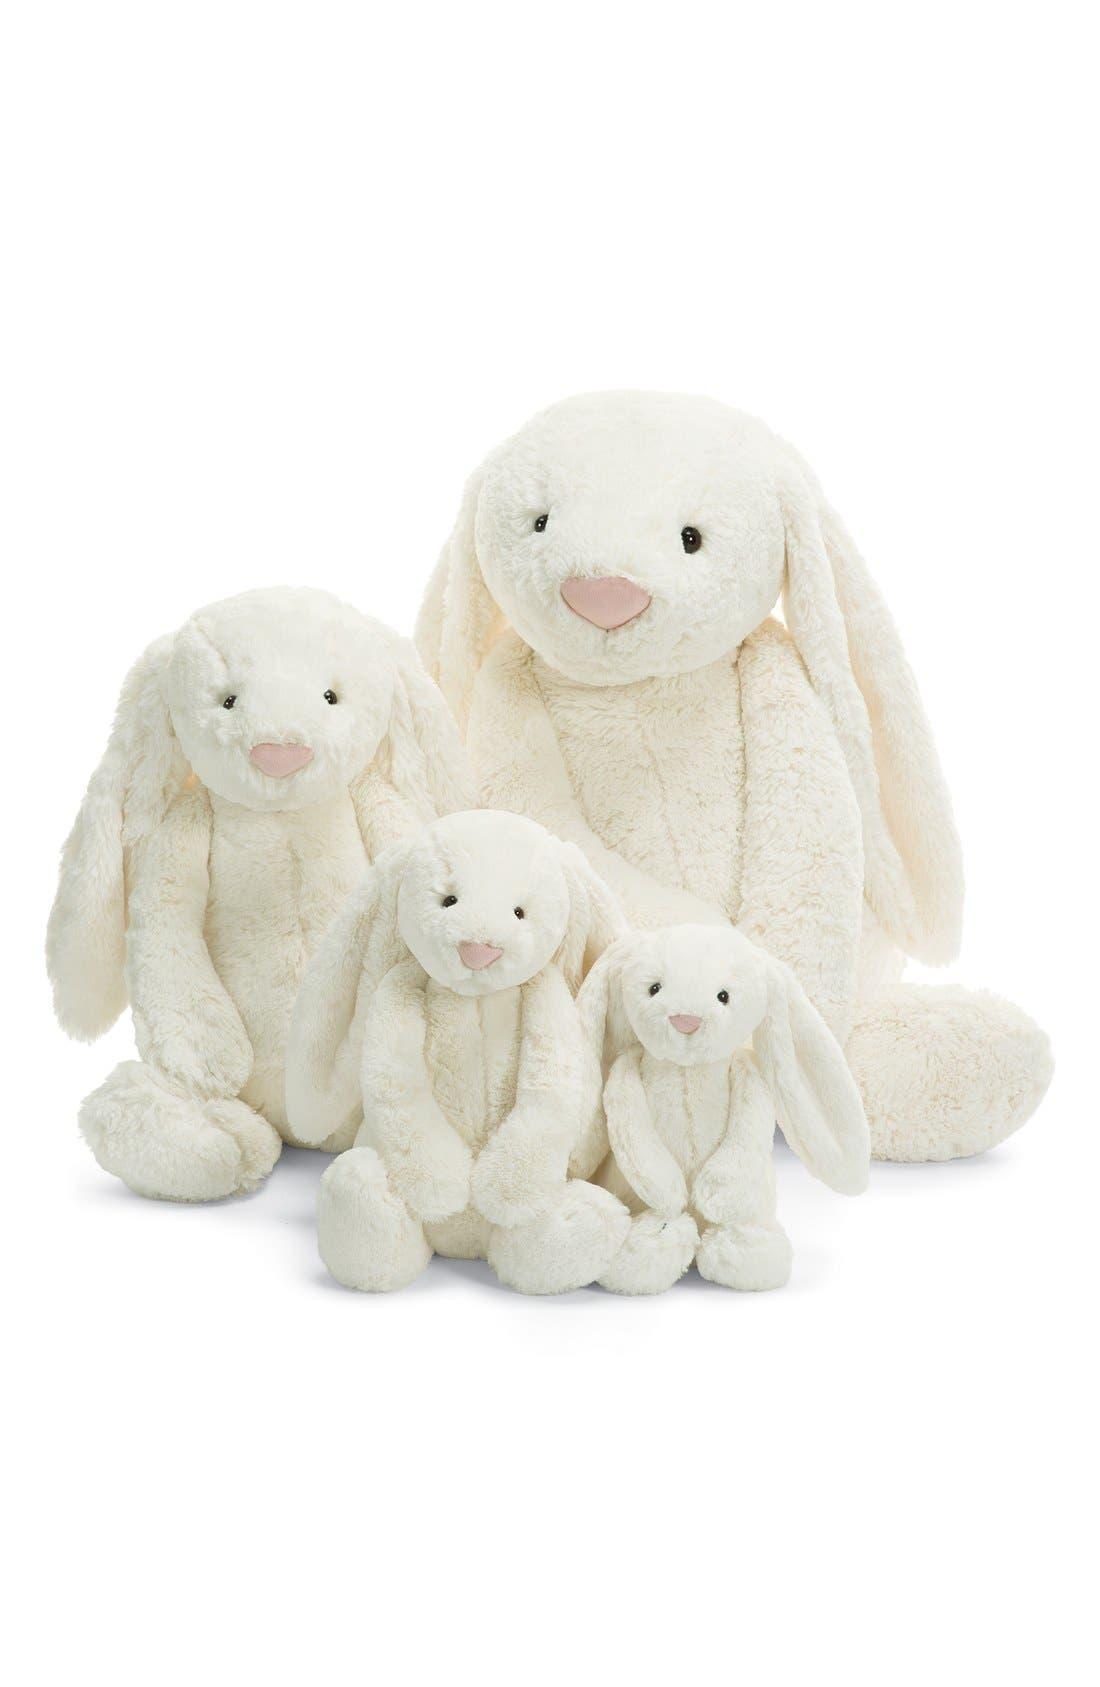 'Large Bashful Bunny' Stuffed Animal,                             Alternate thumbnail 3, color,                             CREAM